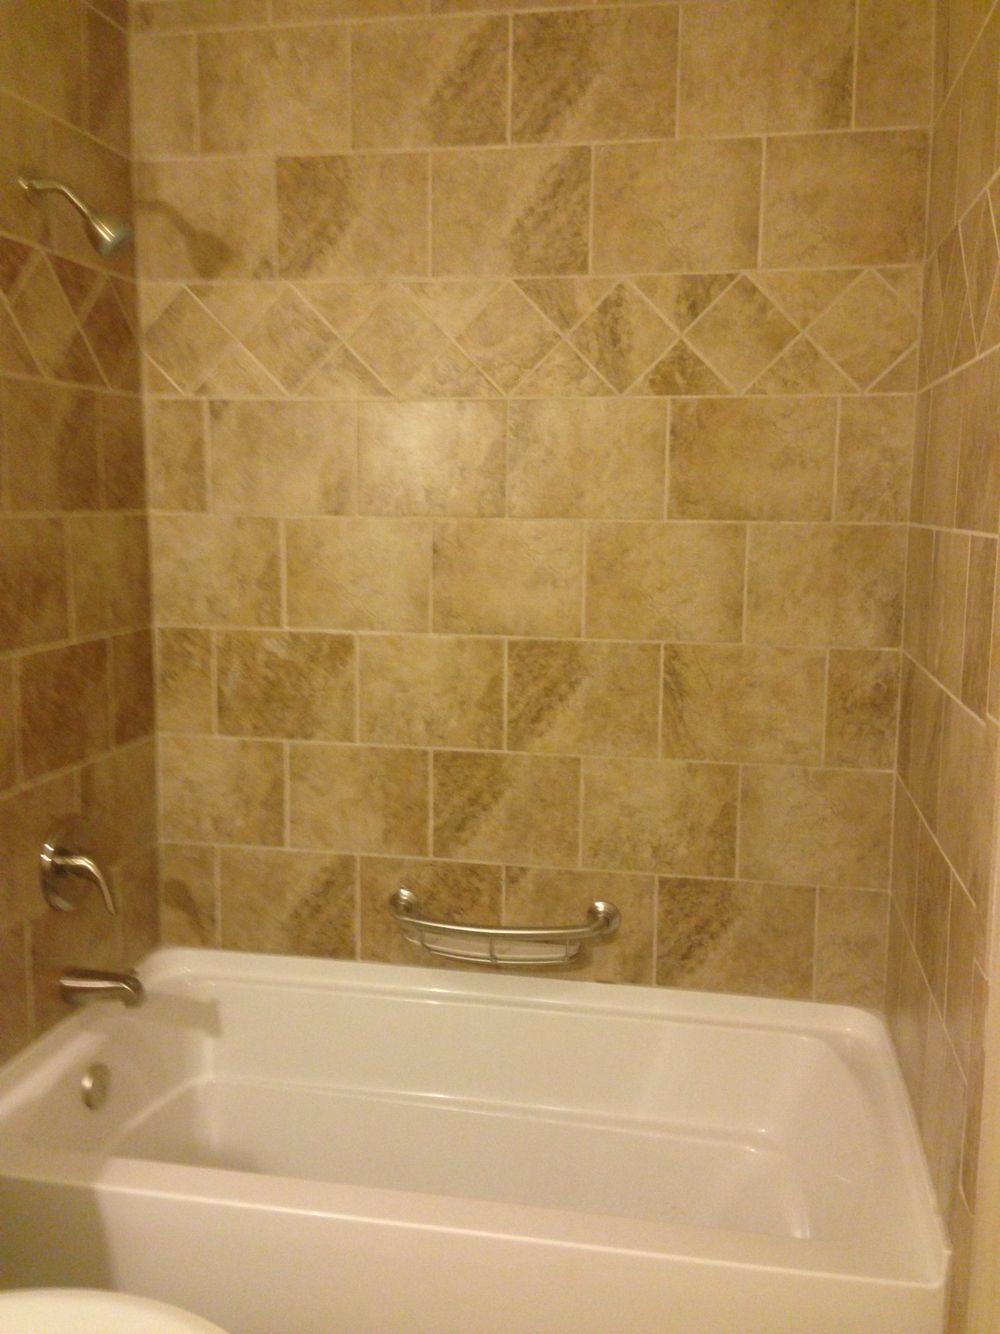 Beige tile tub surround with diamond border pattern. Tiled bathtub ...